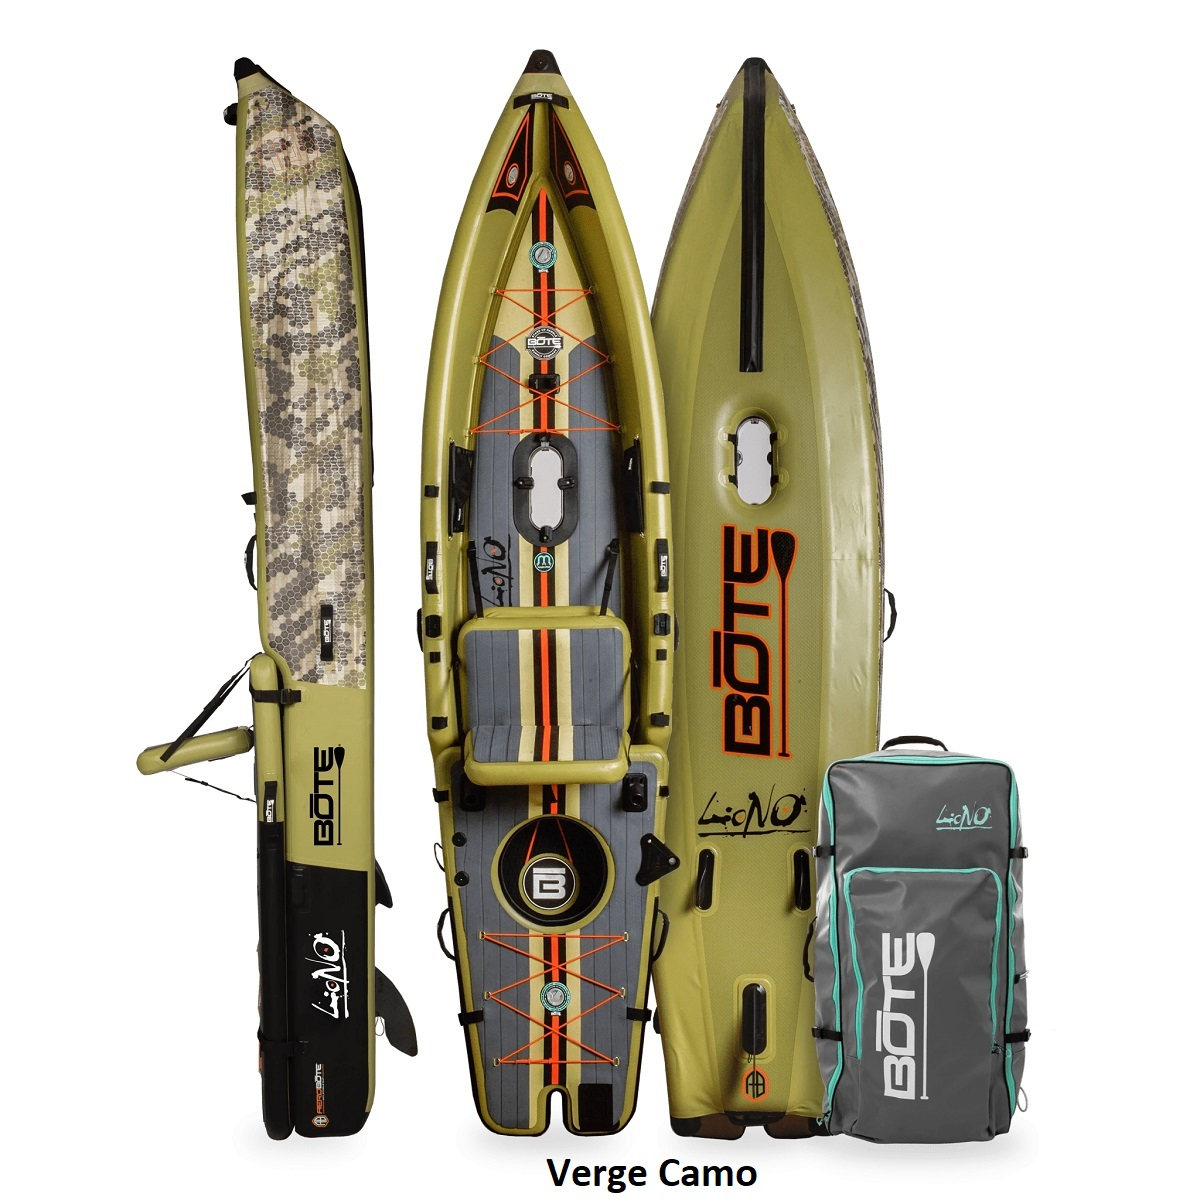 BOTE Lono Inflatable Kayak - Verge Camo 1